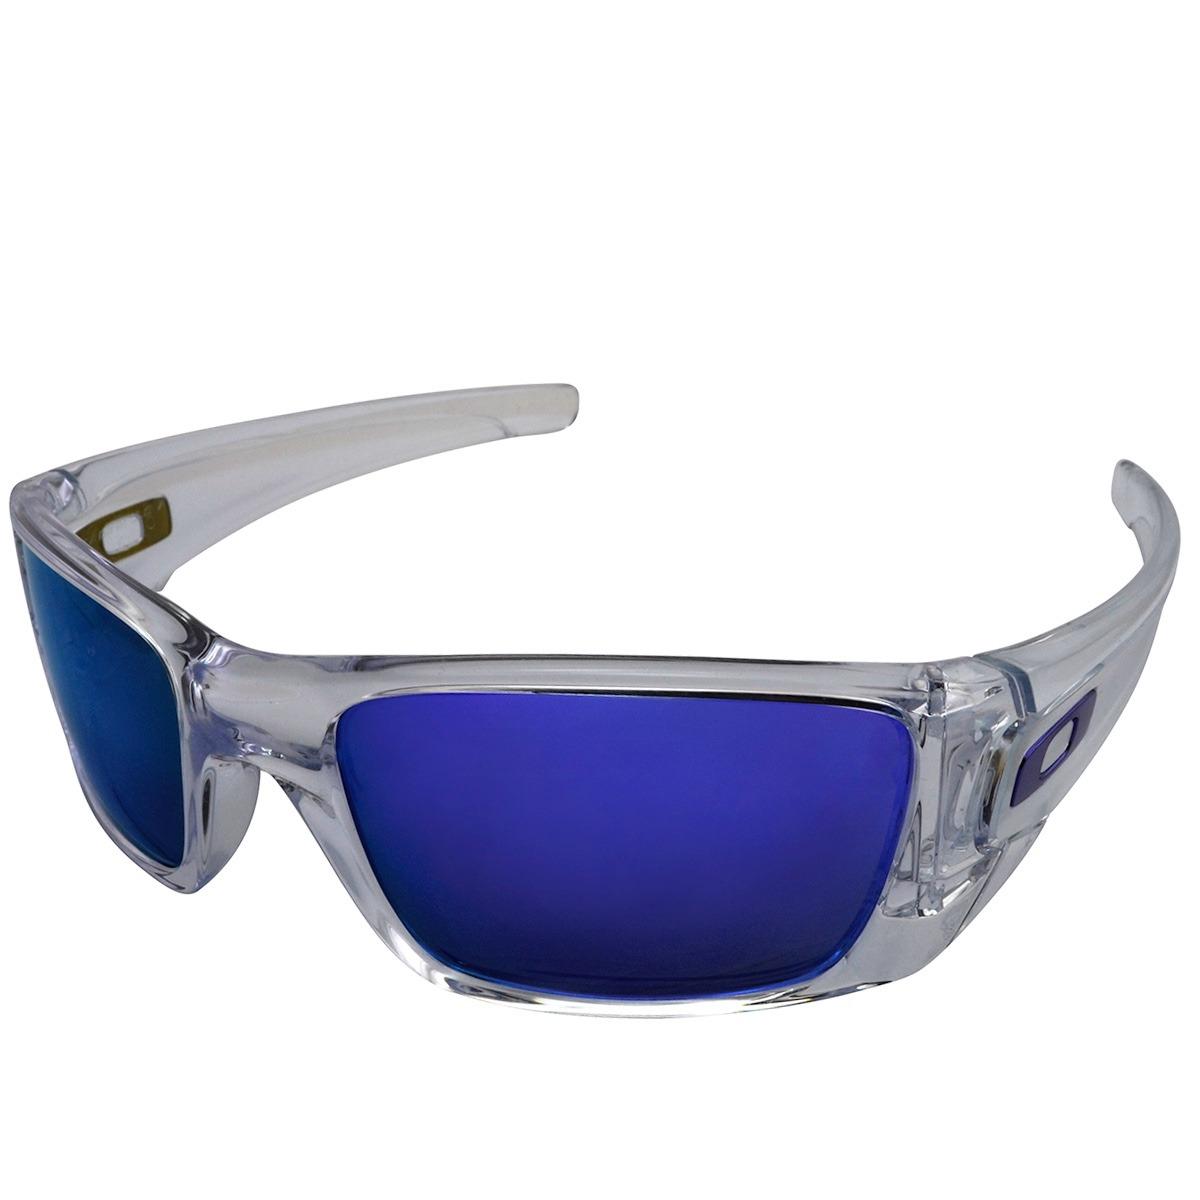 0ed57979d1122 oculos oakley fuel cell polished clear violet iridium oferta. Carregando  zoom.